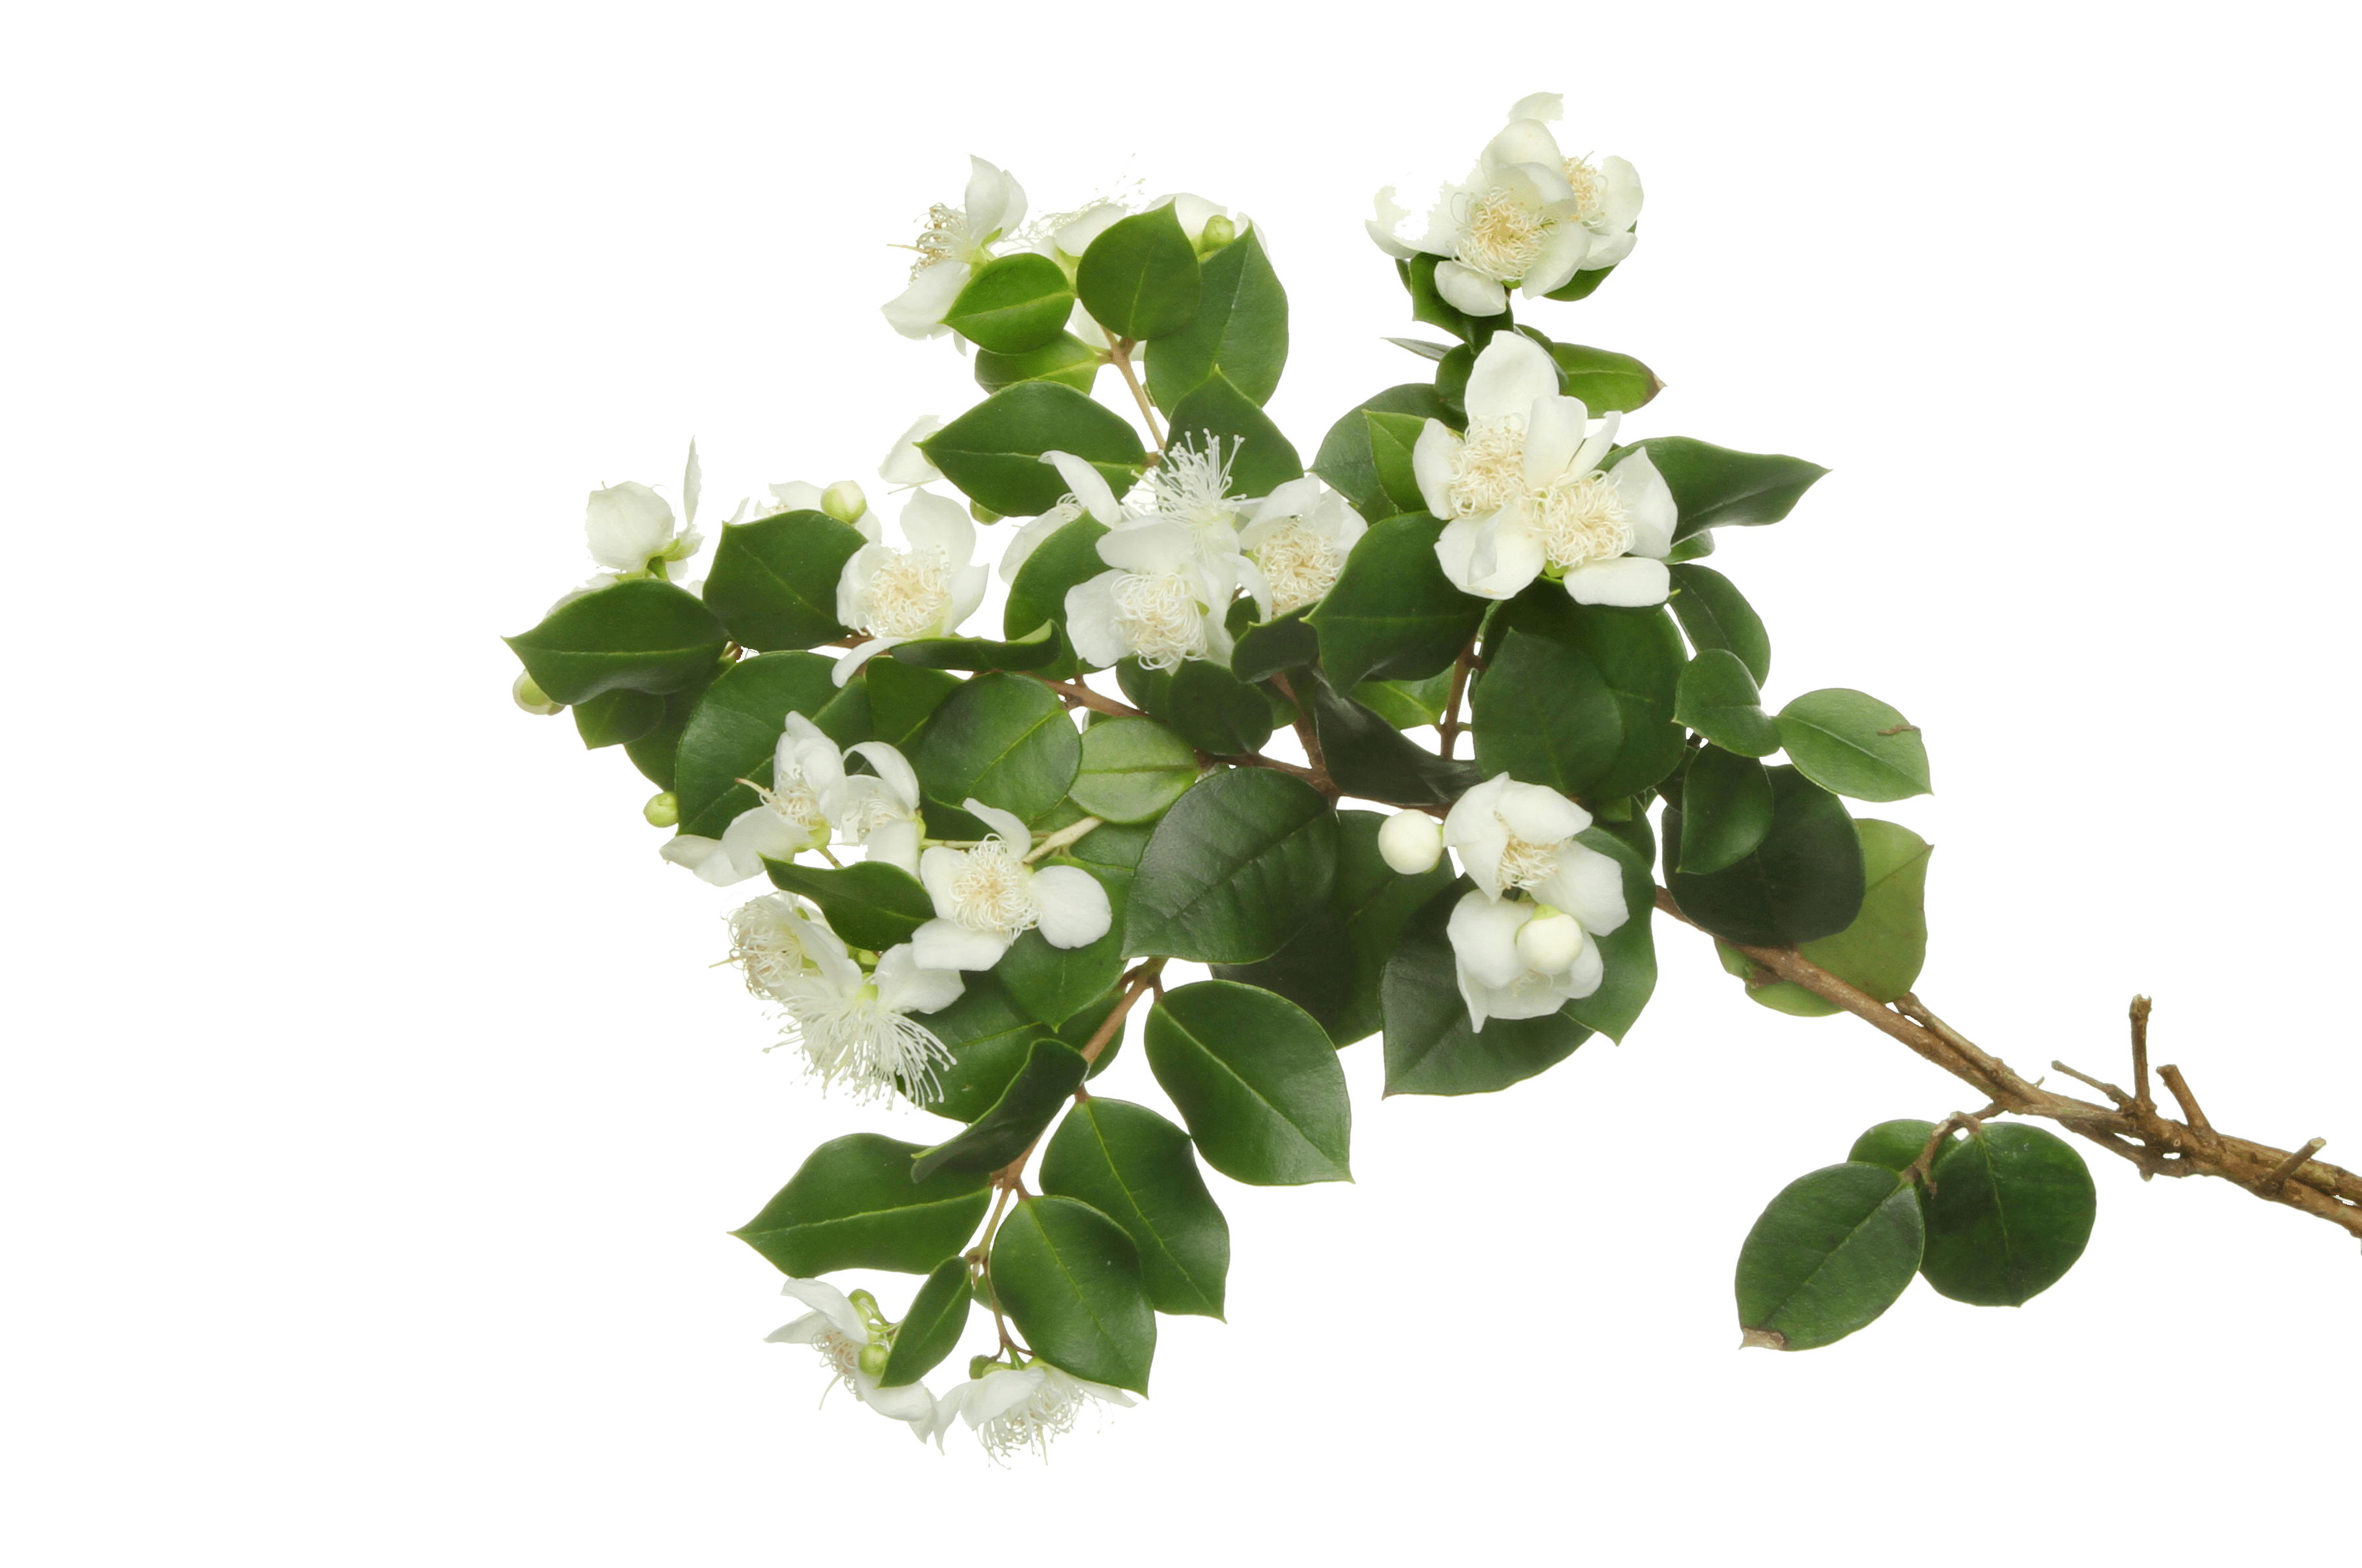 Herbs 17 - Ellia Natural Cosmetics - Cyprus Europe